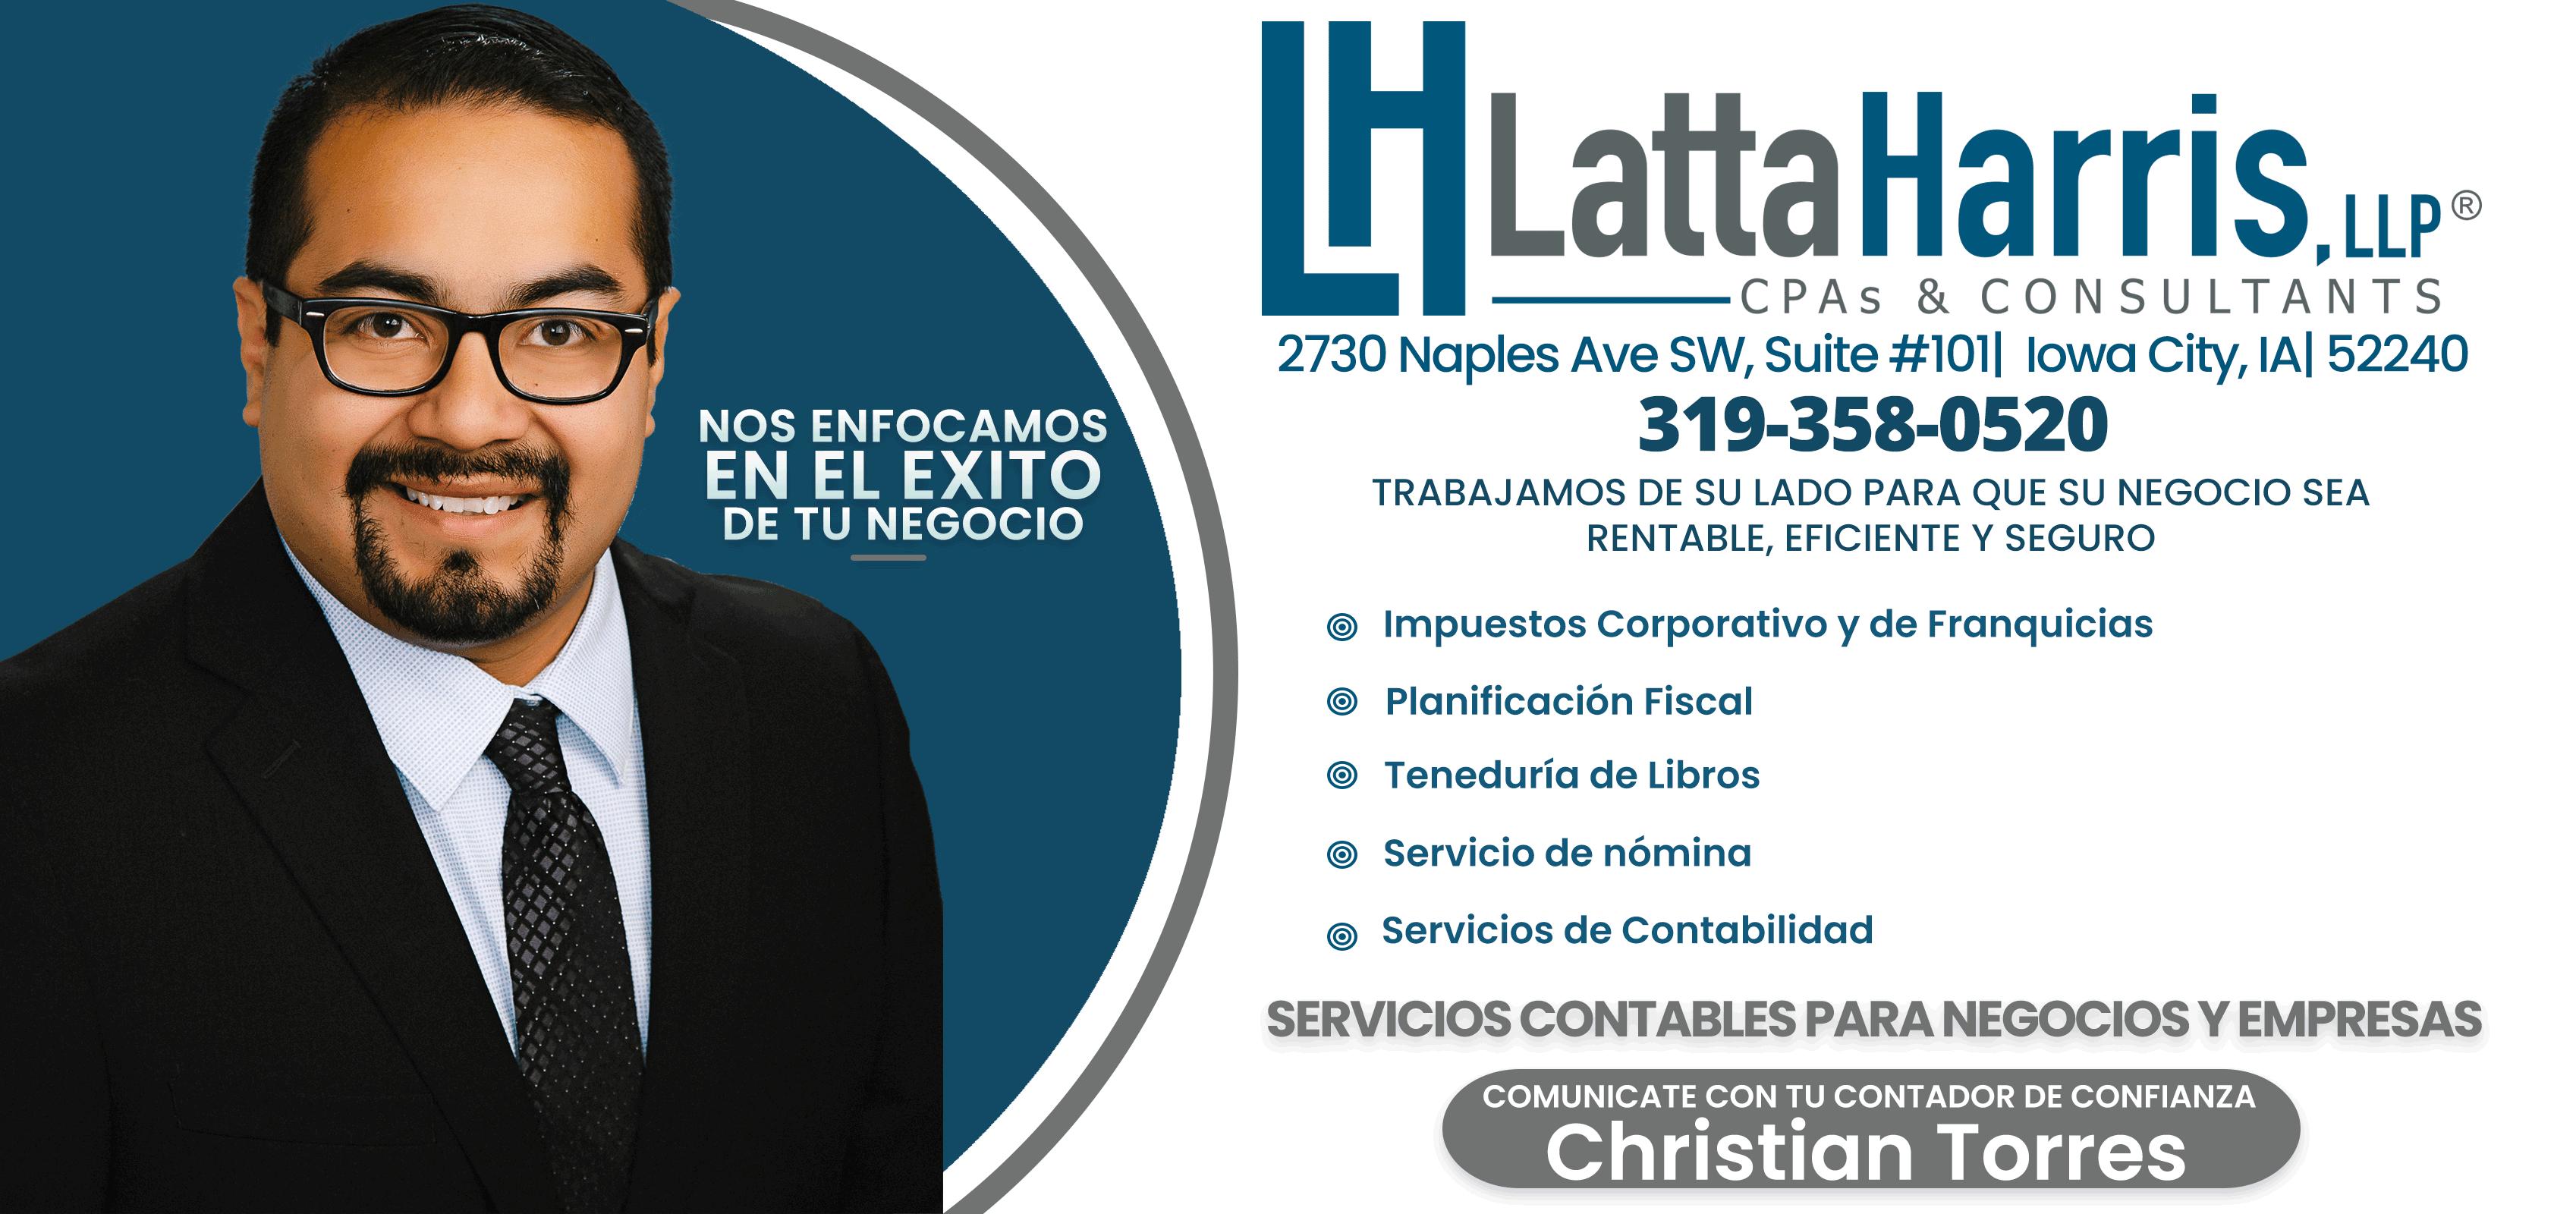 LattaHarris